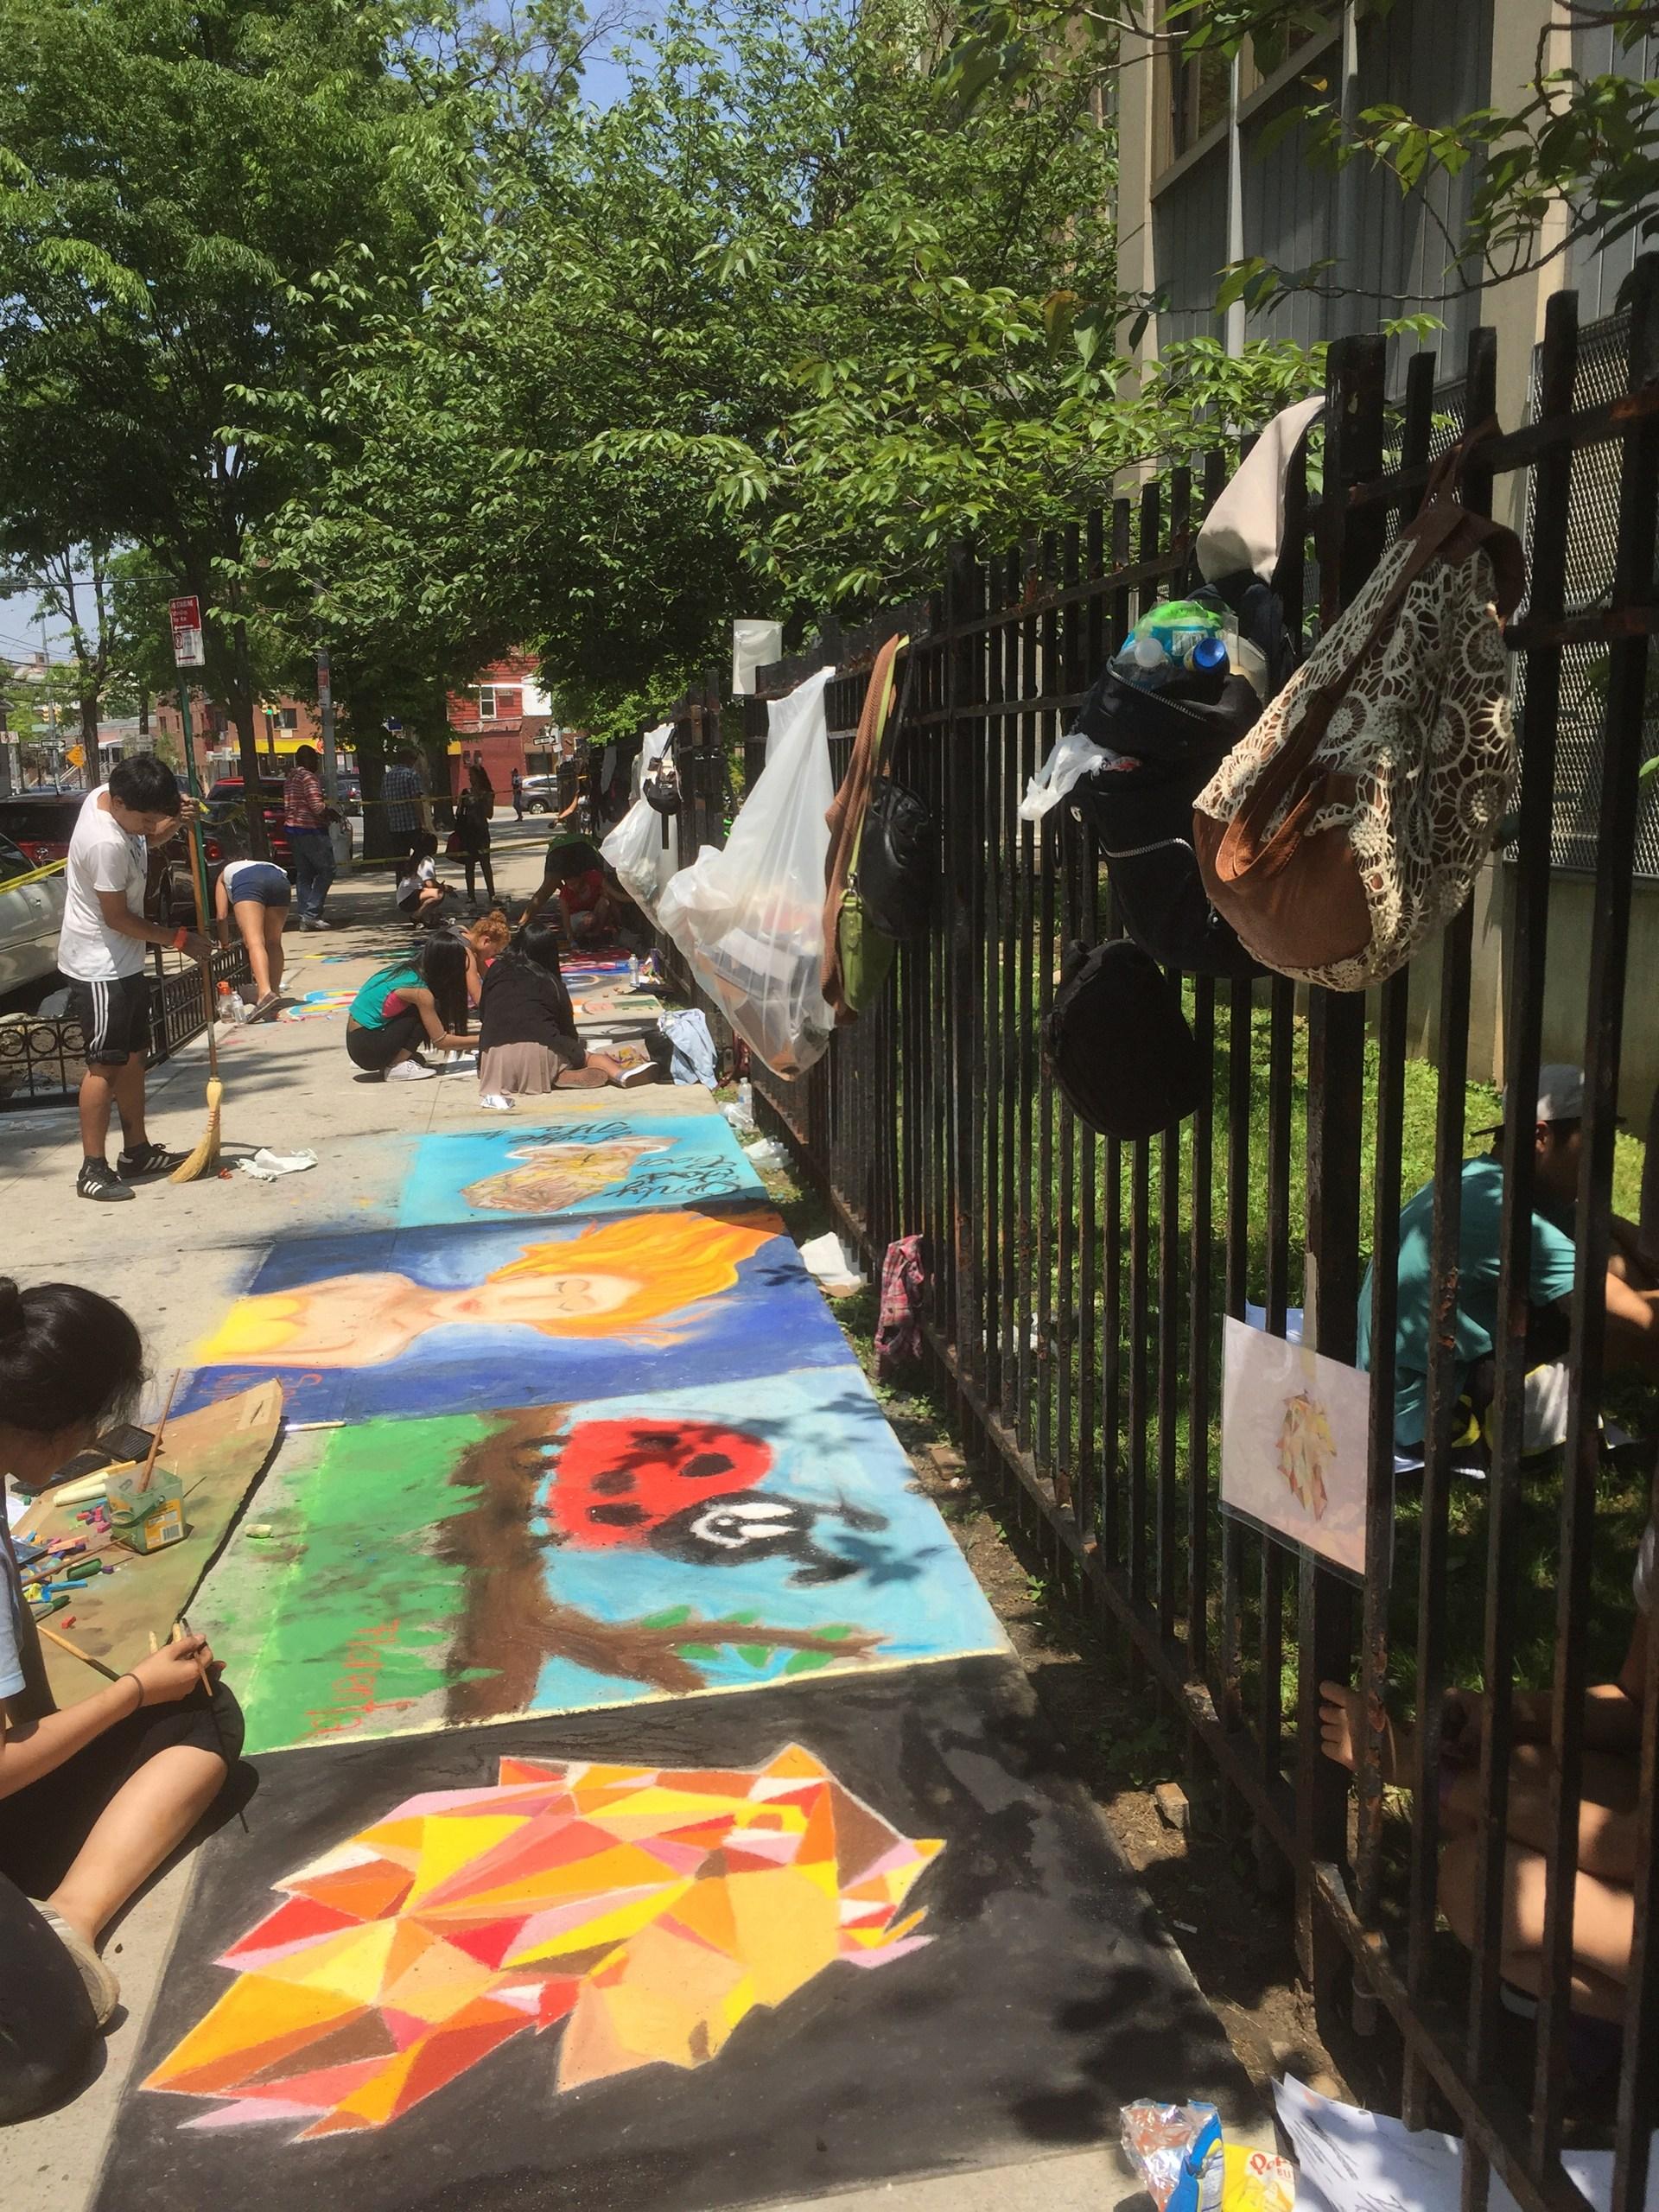 Students drawing on sidewalk.